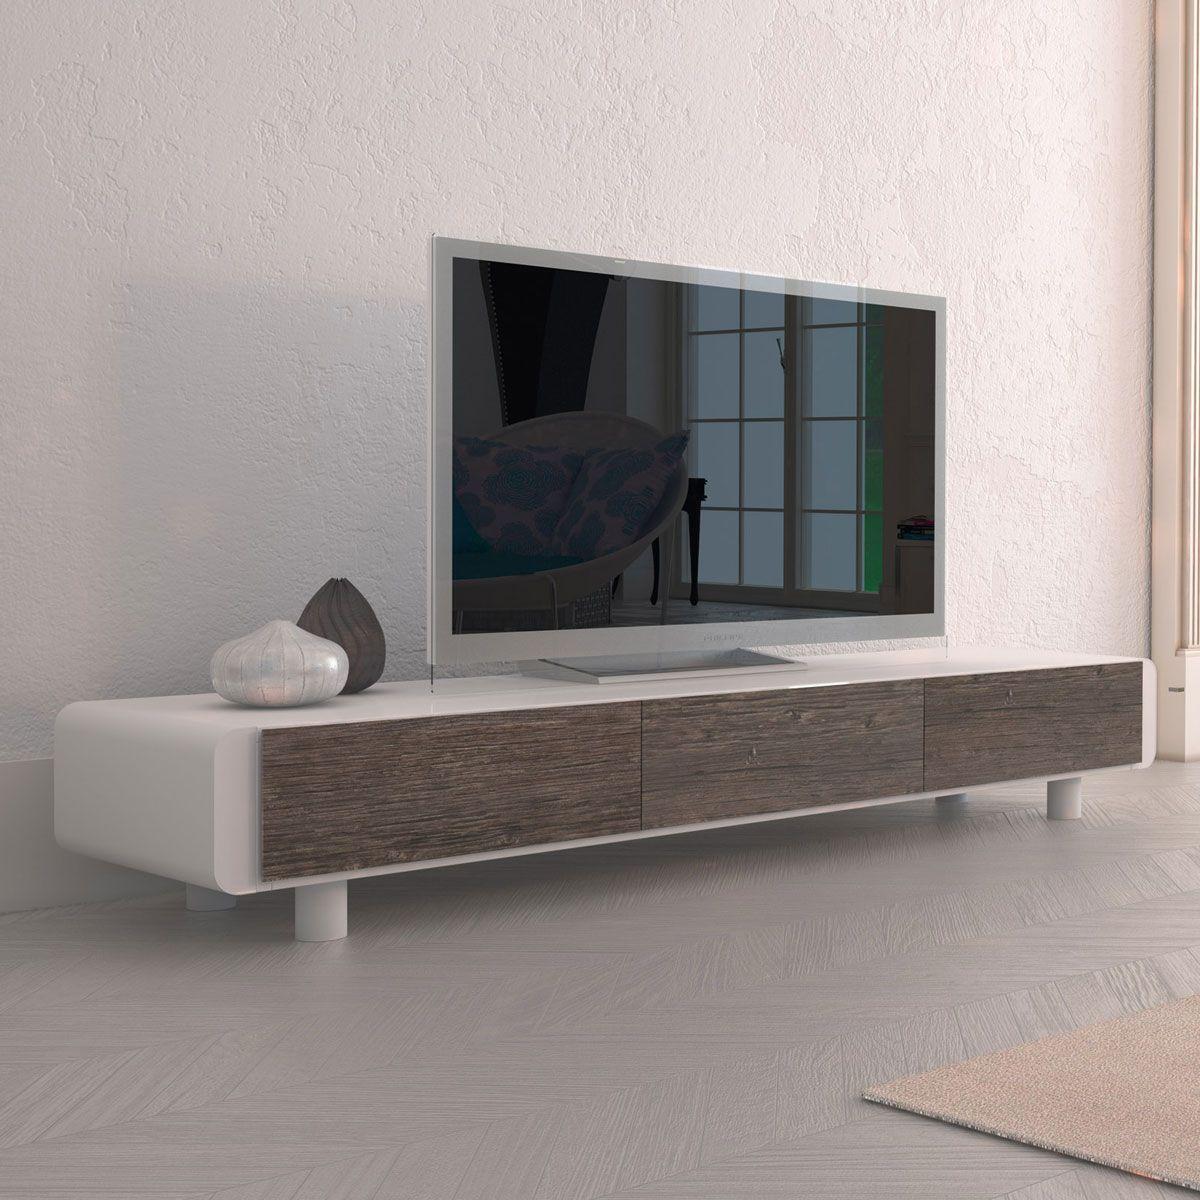 schön tv möbel lowboard weiß   tv möbel lowboard tv